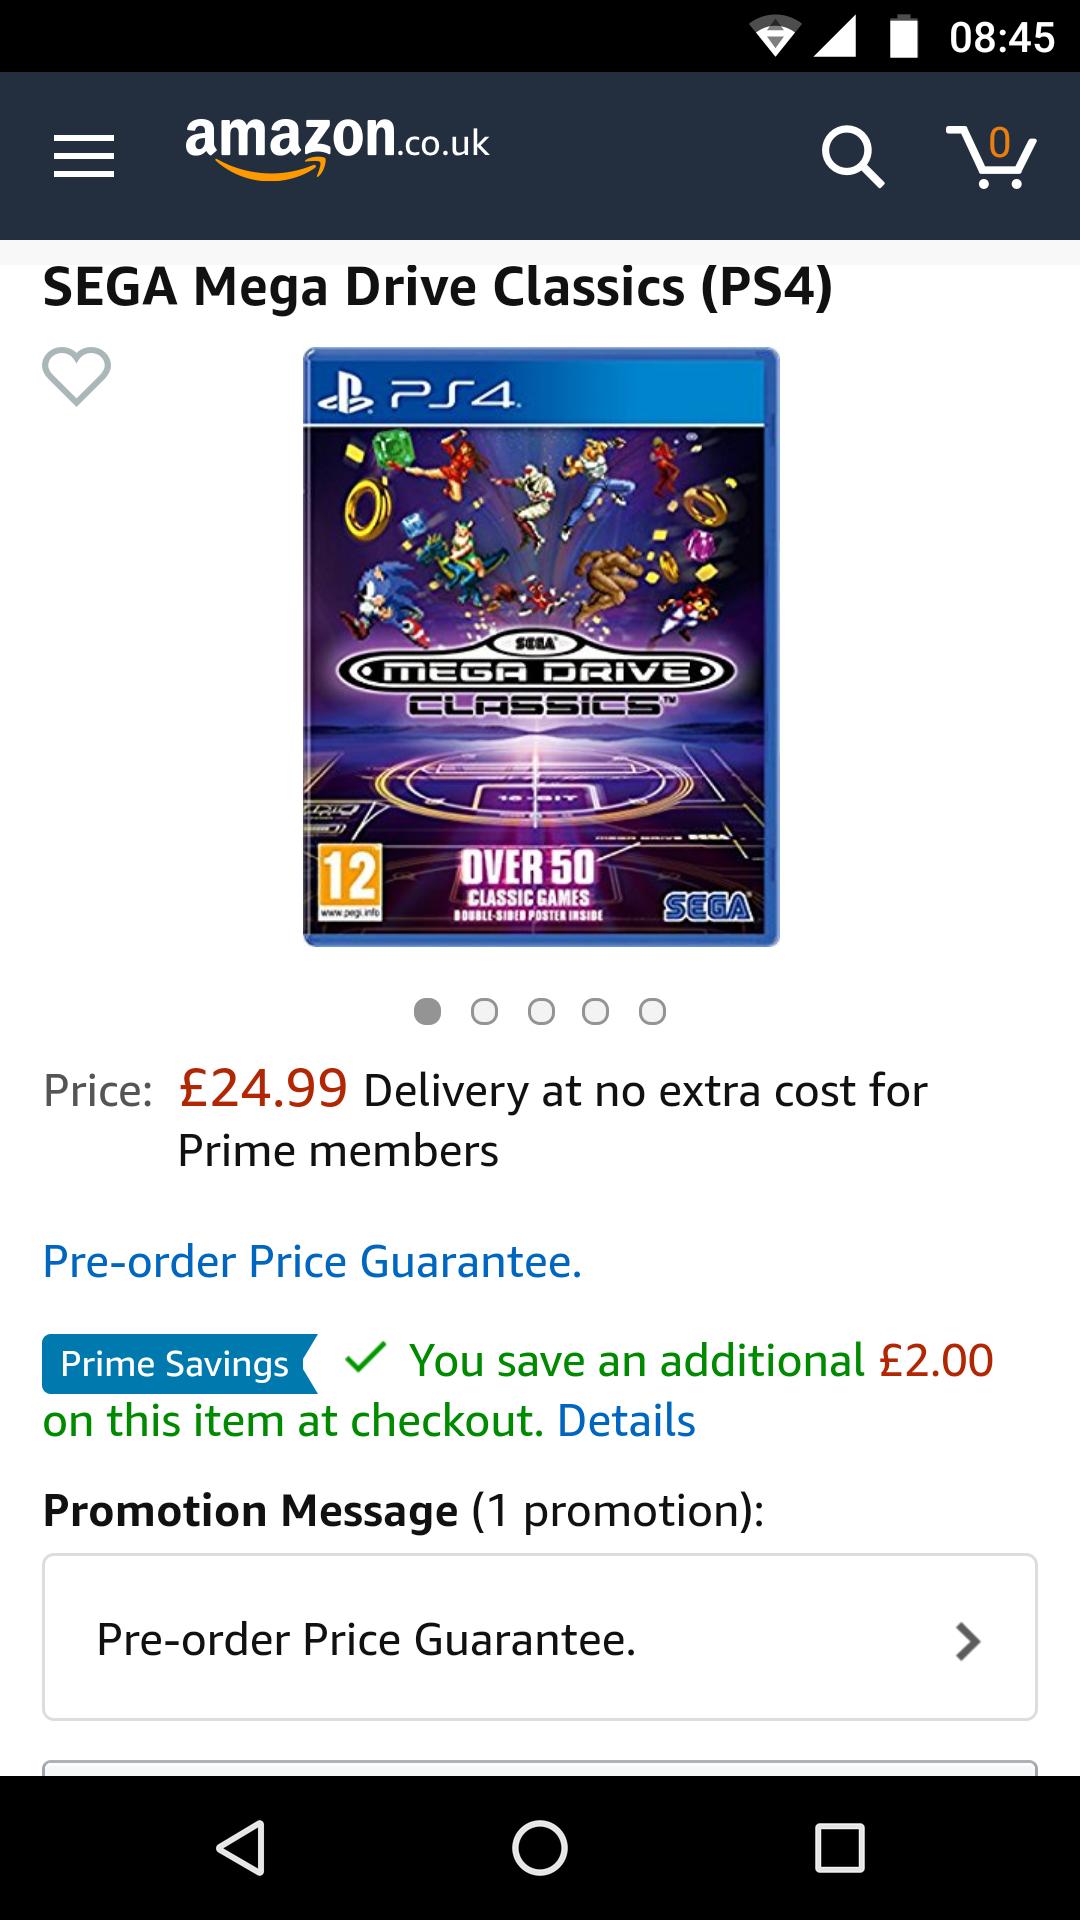 Sega Megadrive Classics PS4 & Xbox One game £22.99 with prime discount / £24.99 non-prime